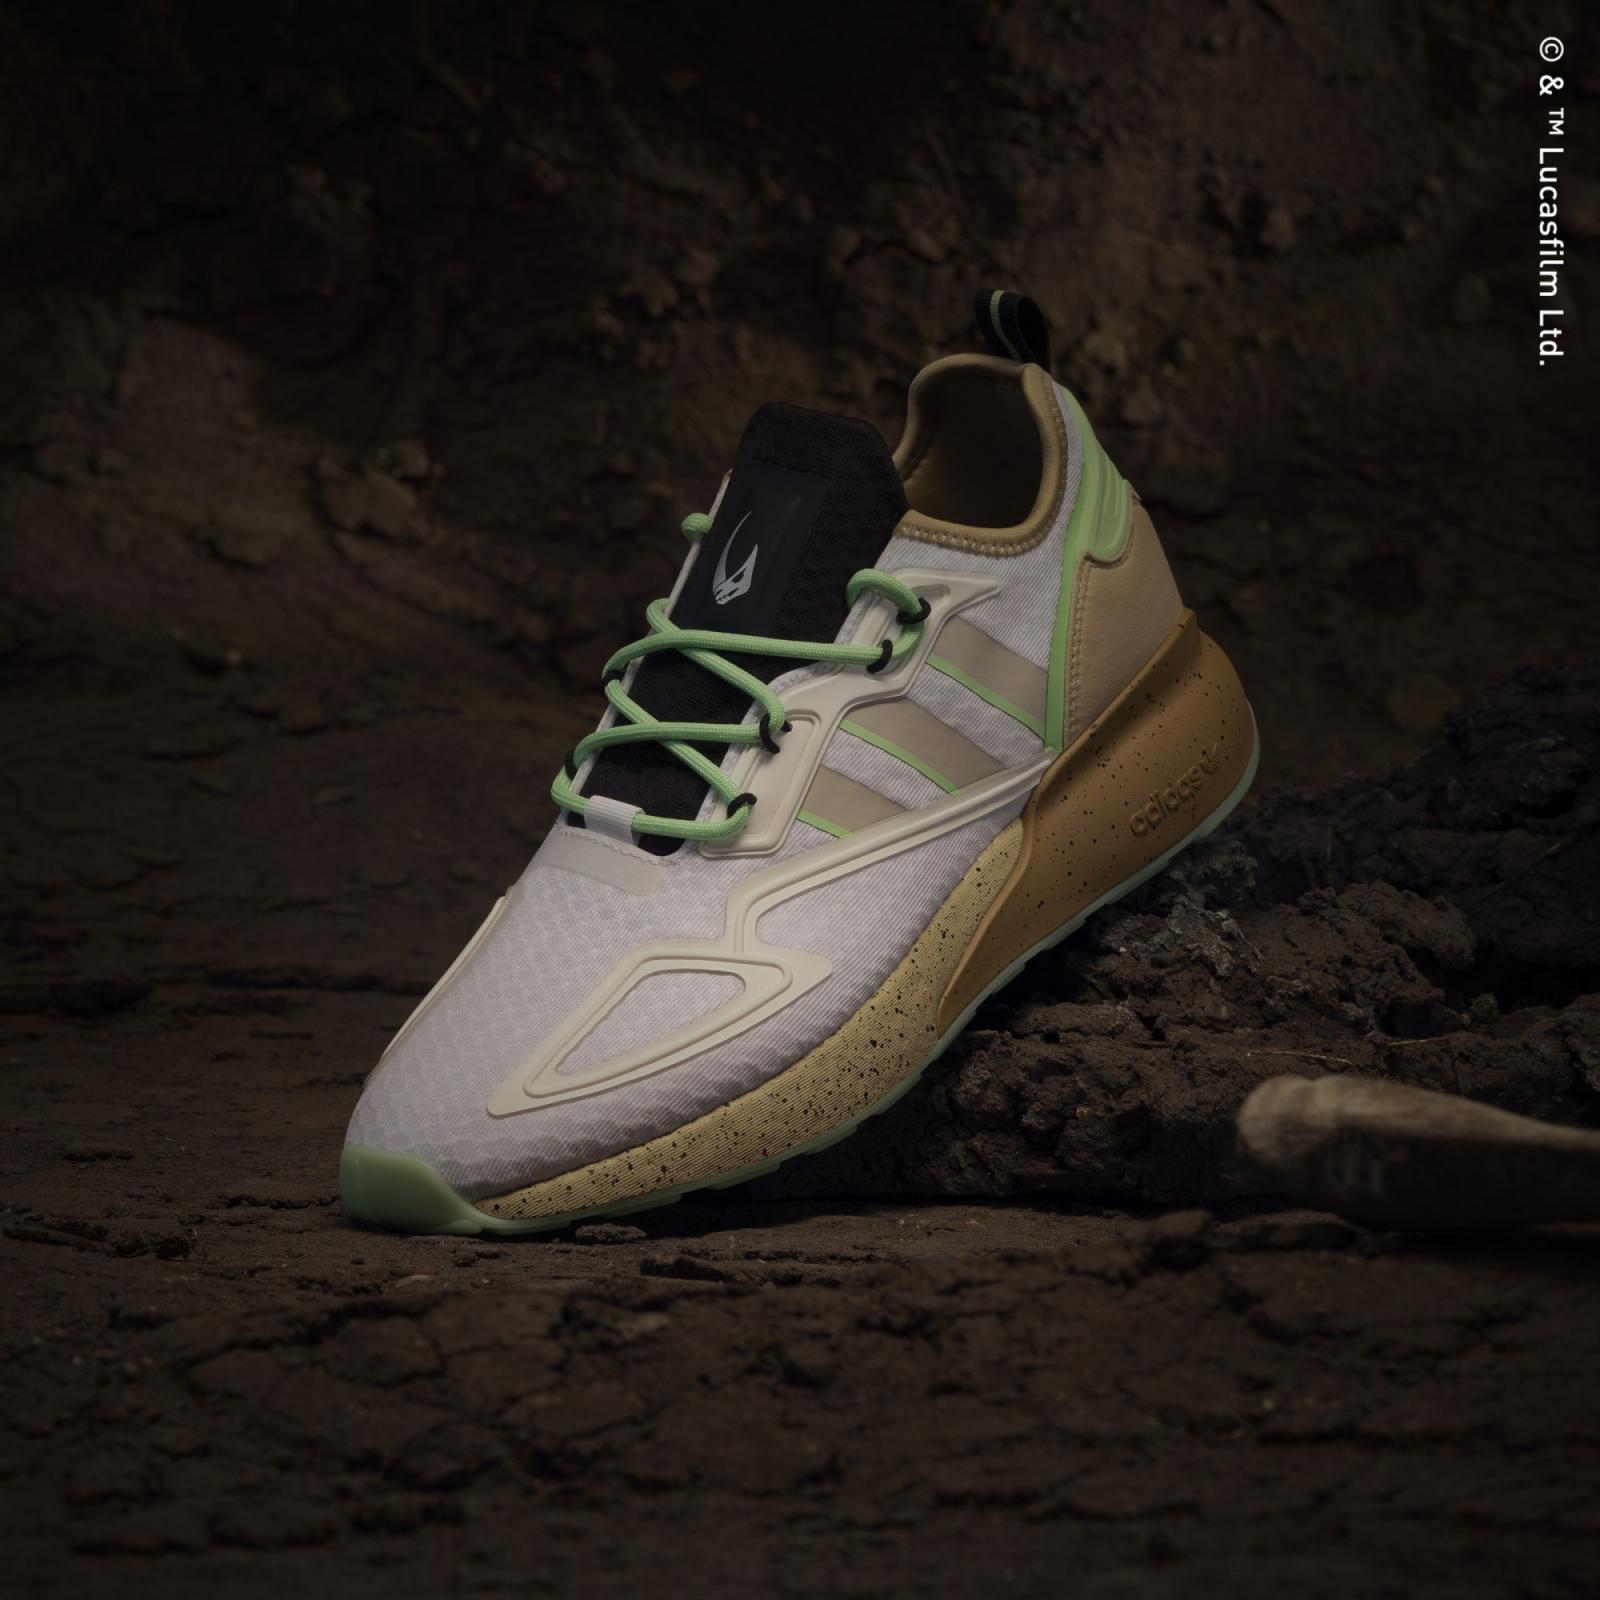 adidas Originals发布全新The Mandalorian™系列ZX 2K Boost Mudhorn